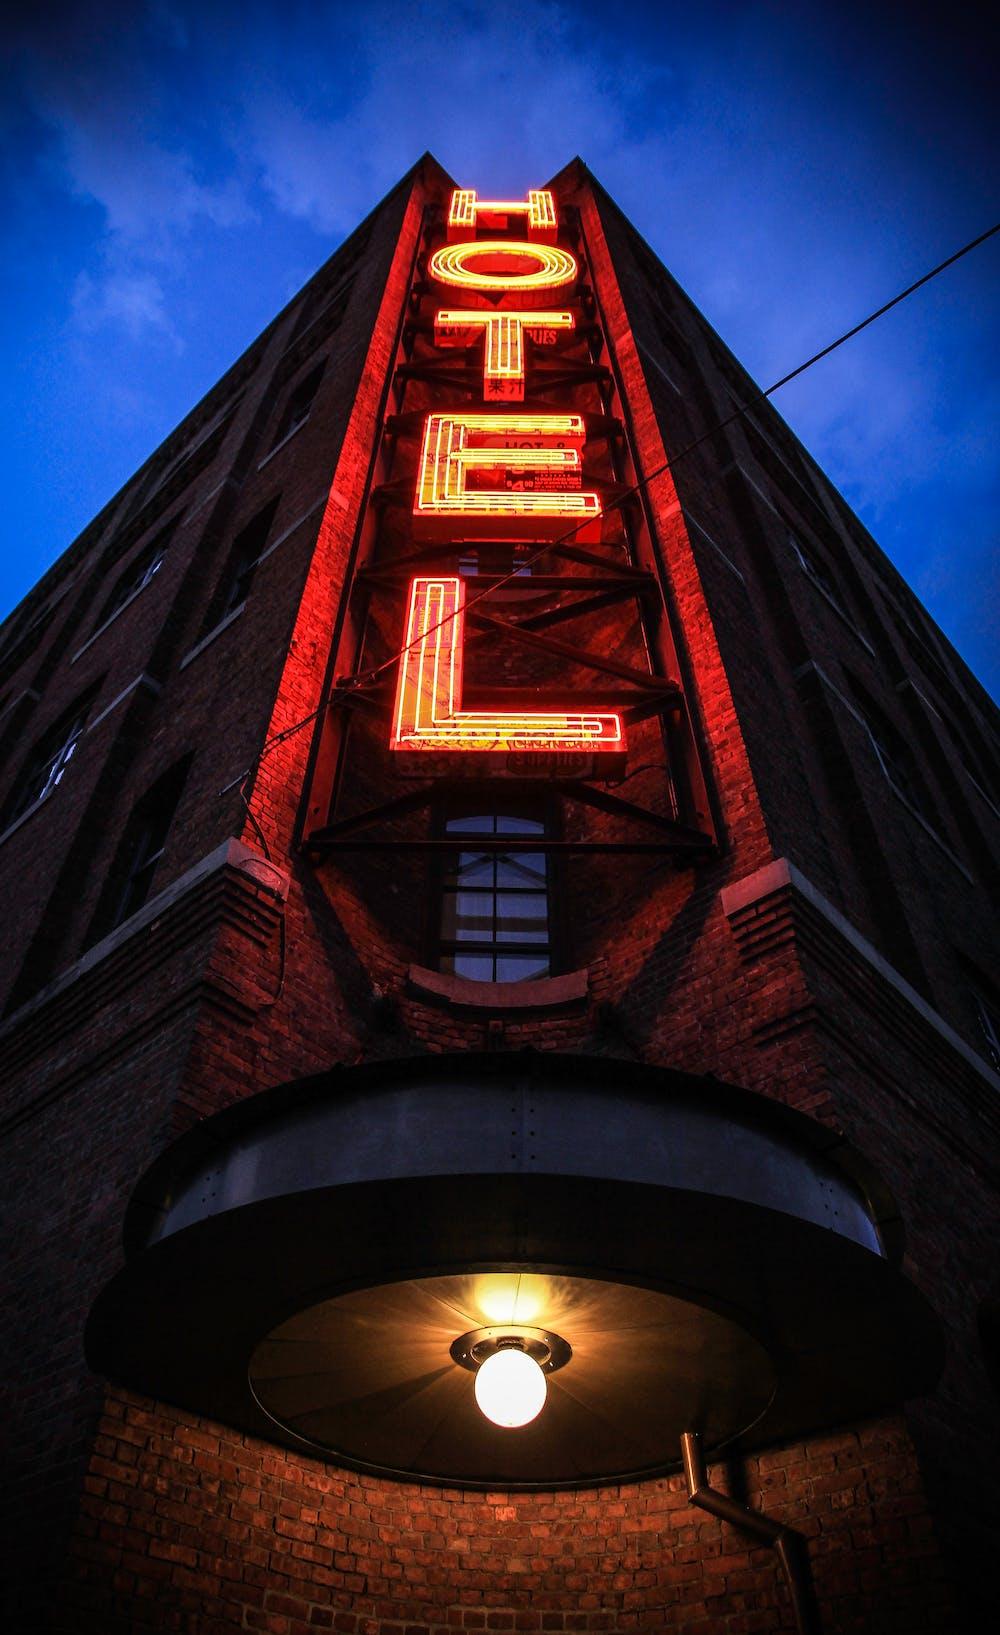 A hotel | Photo: Pexels